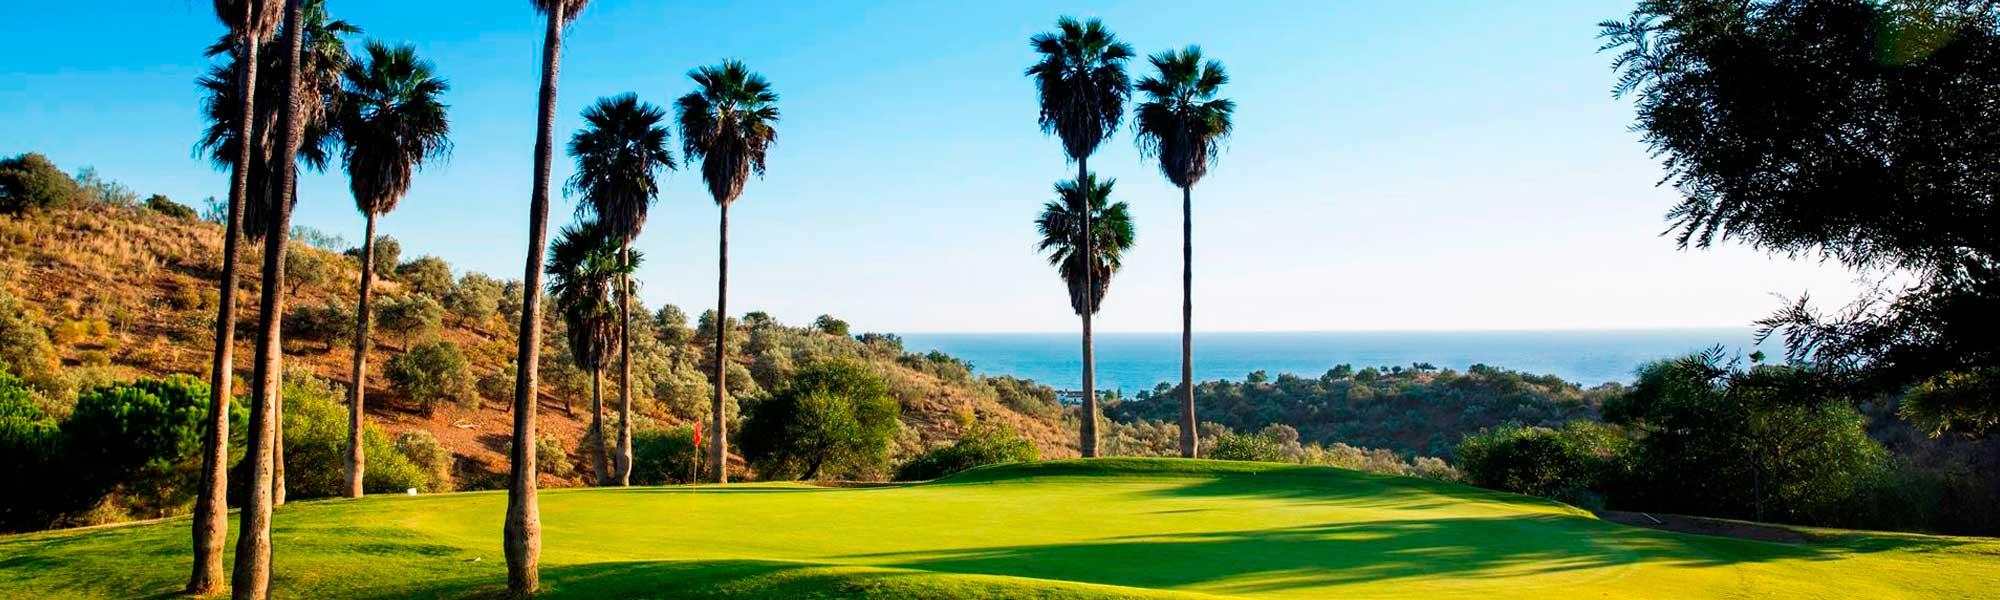 Malaga Golf Courses